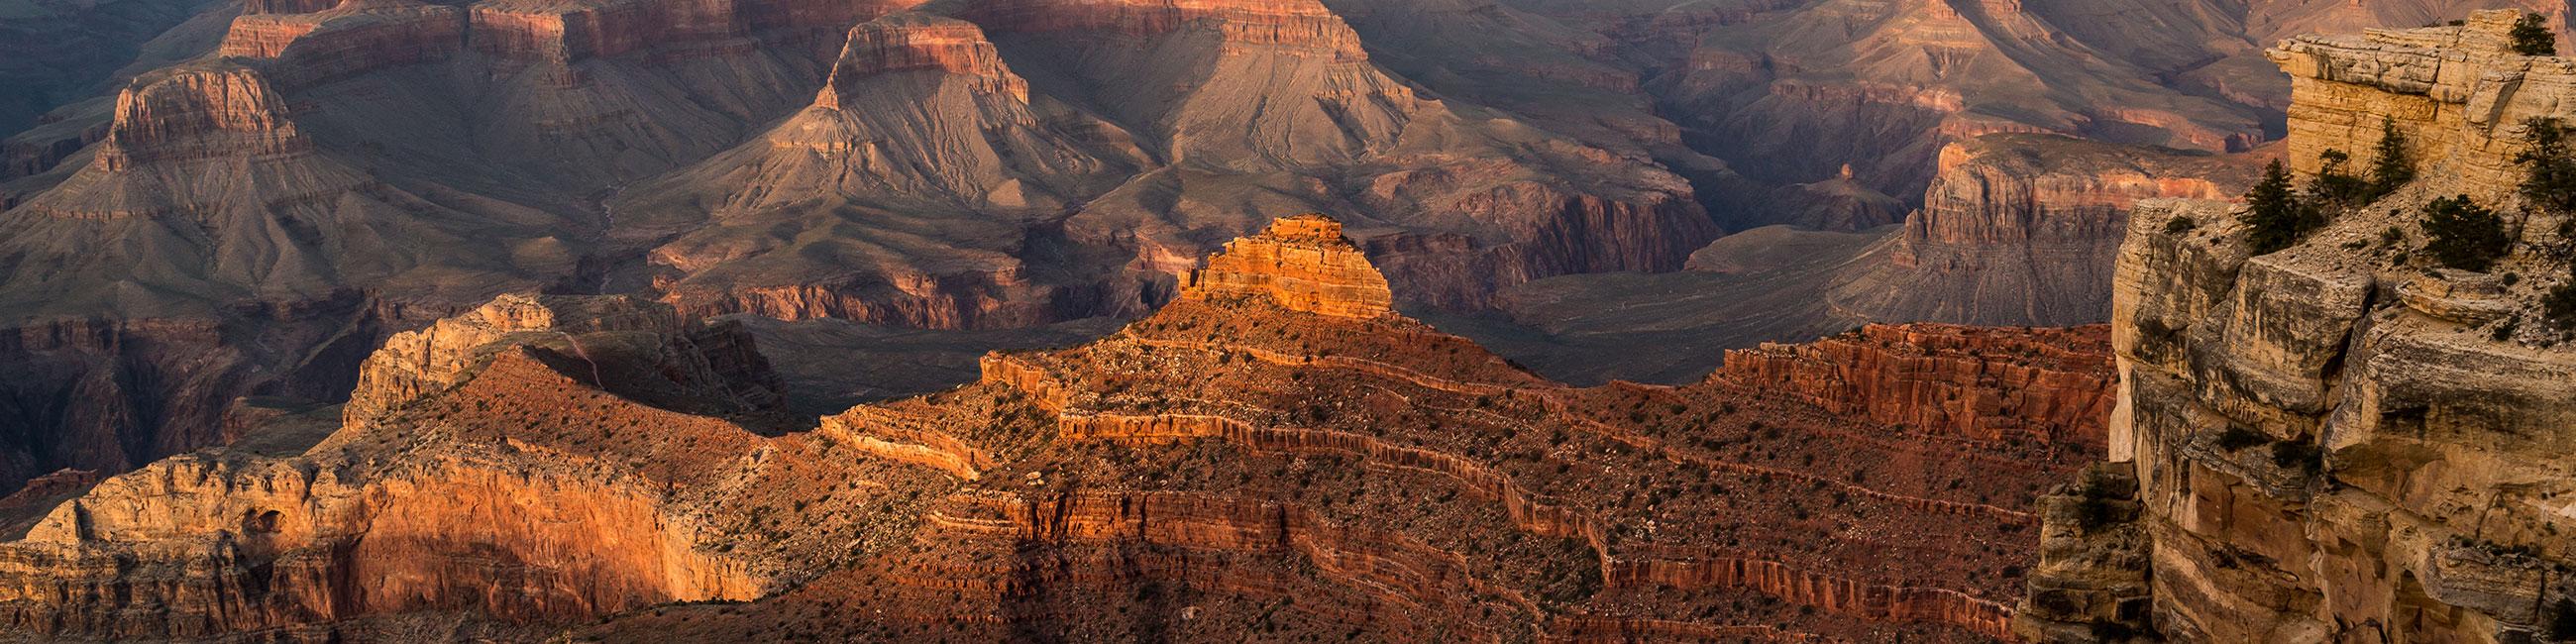 Grand Canyon, ouest américain, USA